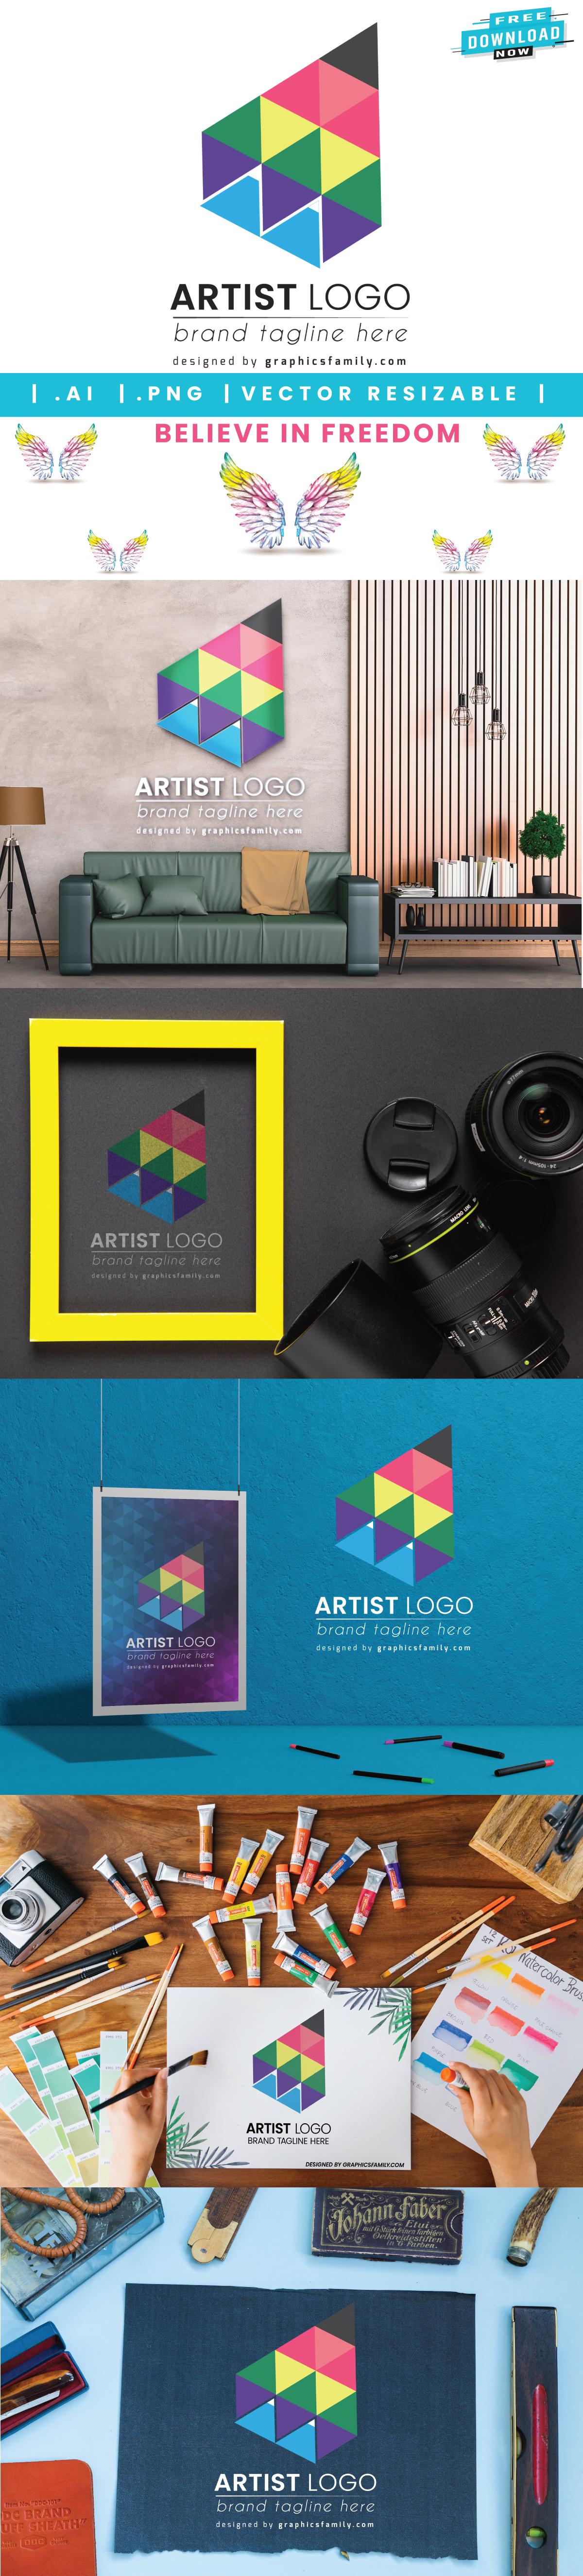 mockup-collection-creative-artist-logo-template